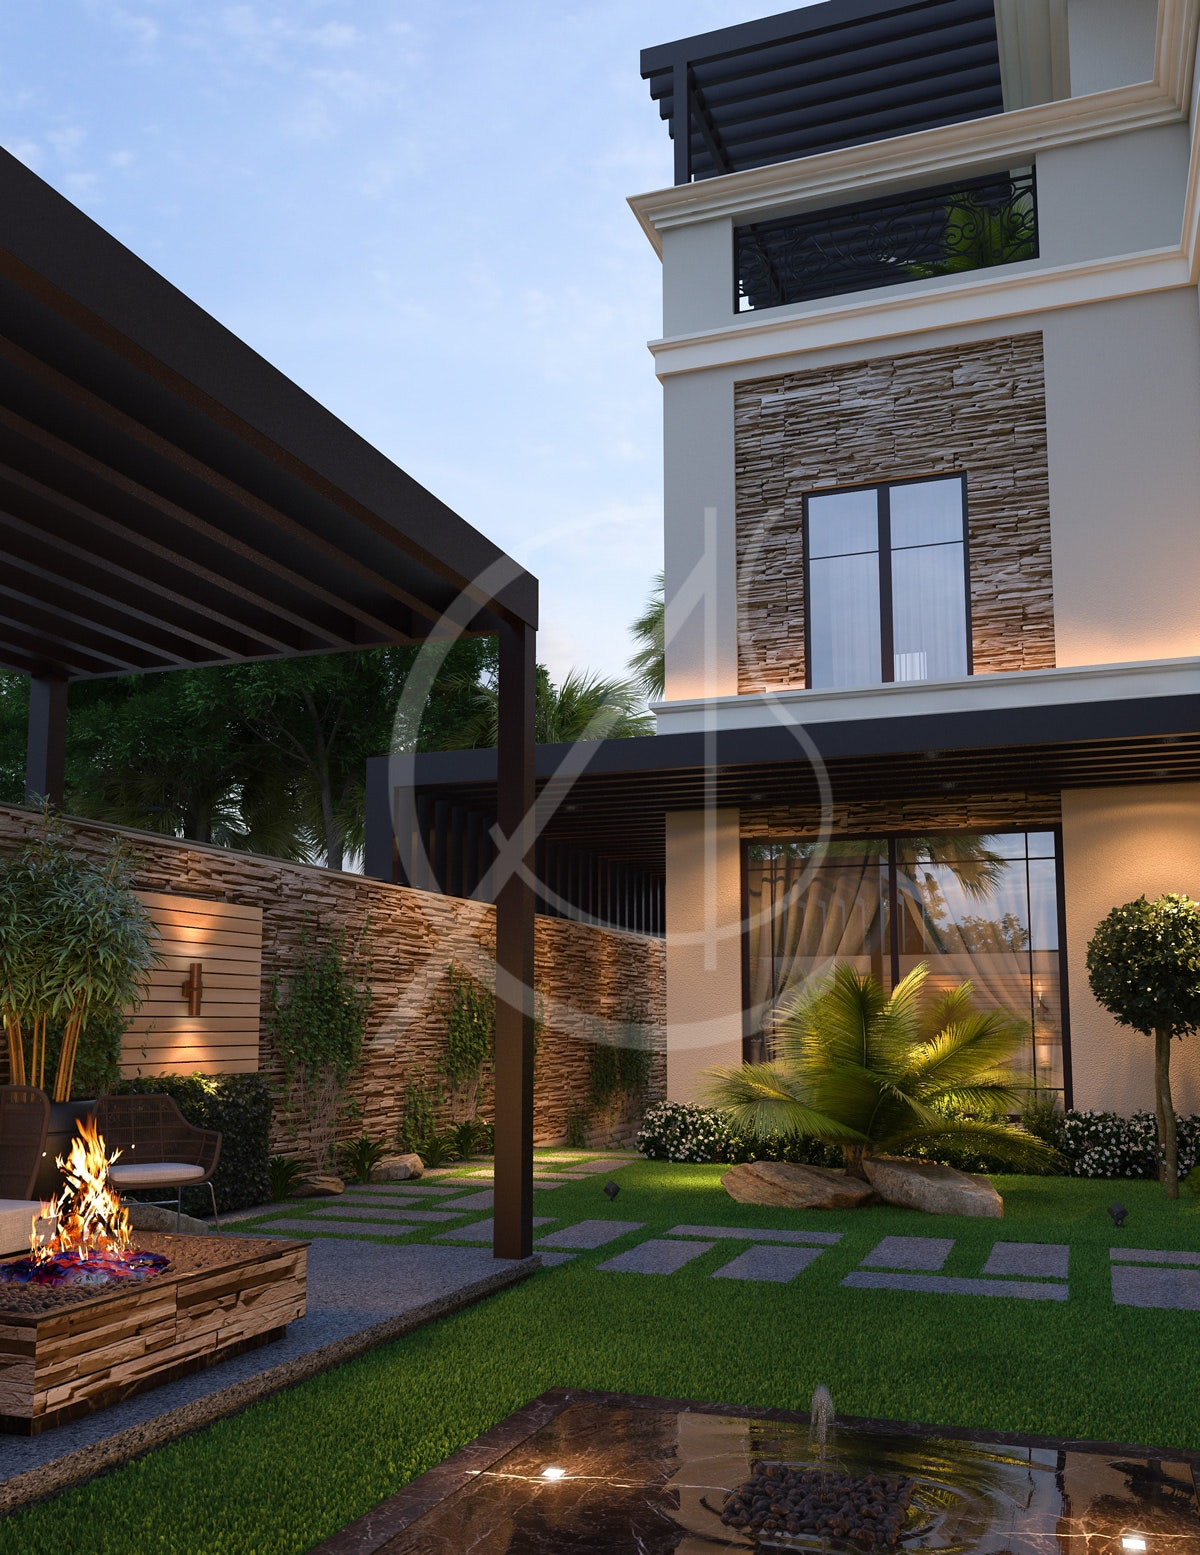 Modern Classic House Design By Comelite Architecture Structure And Interior Design Architizer